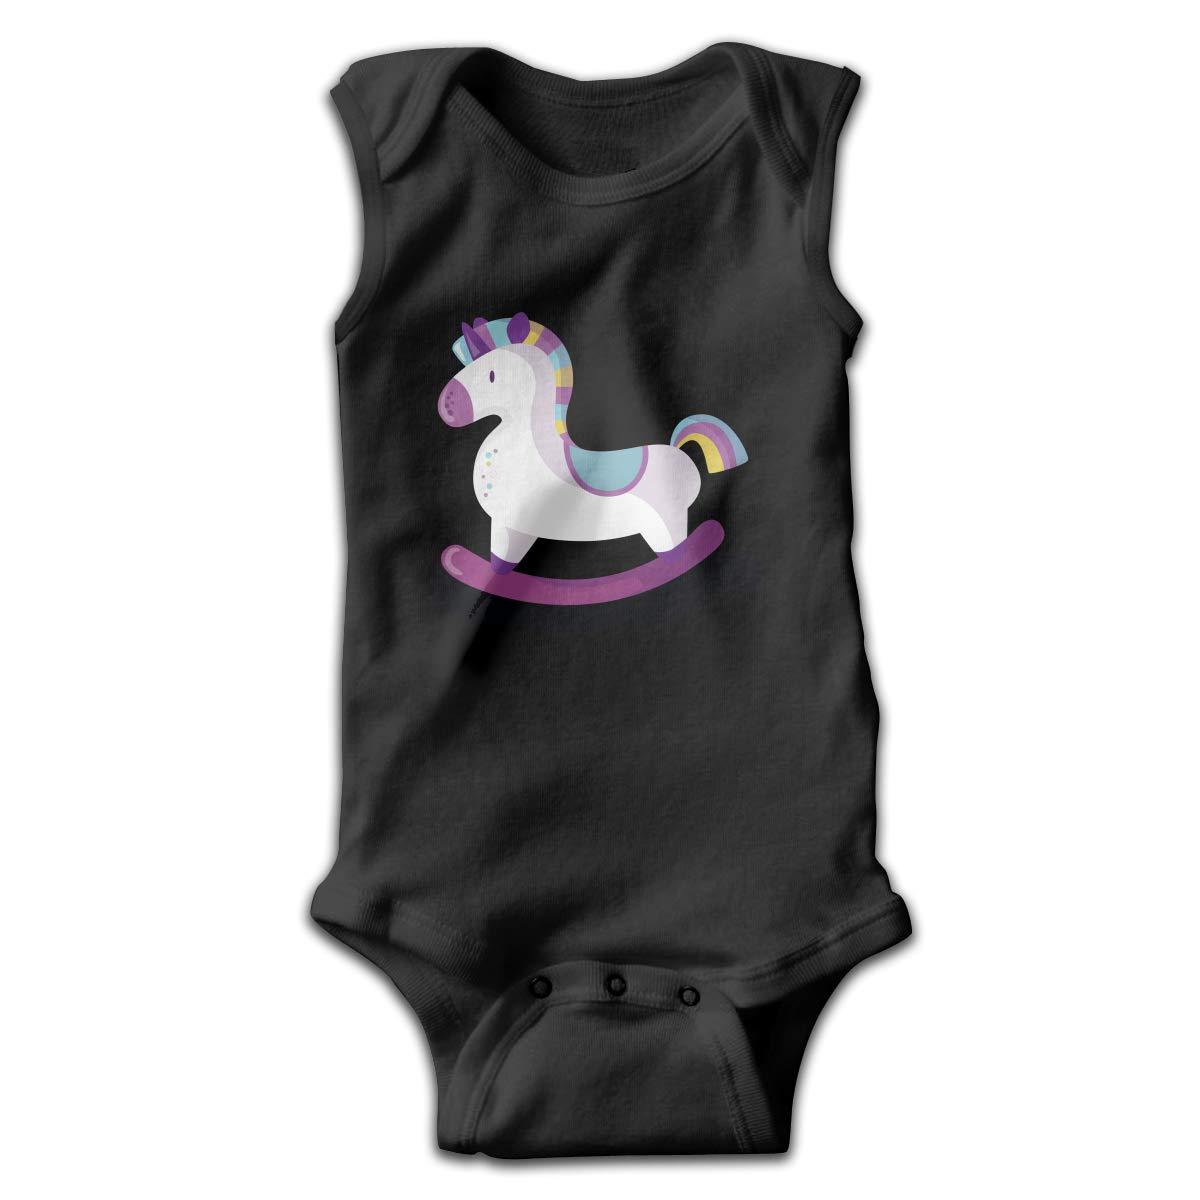 Newborn Baby Boys Rompers Sleeveless Cotton Jumpsuit,Wooden Horse Toys Bodysuit Summer Pajamas